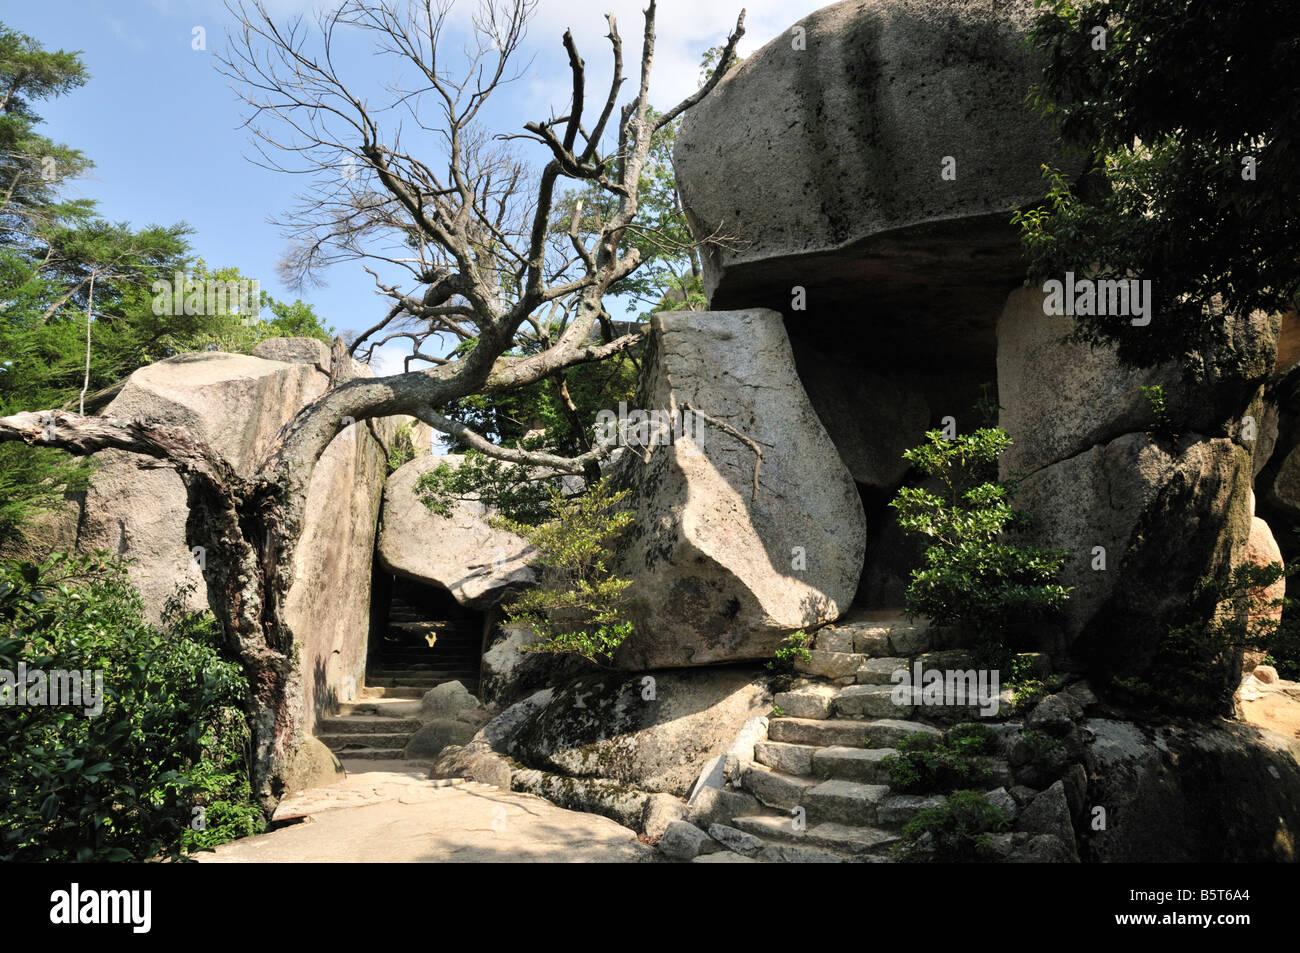 Kuguri-iwa (Duck-under Rock) and Fudo-iwa (Acala Rock) on the Mount Misen walk, Miyajima Island, Japan - Stock Image